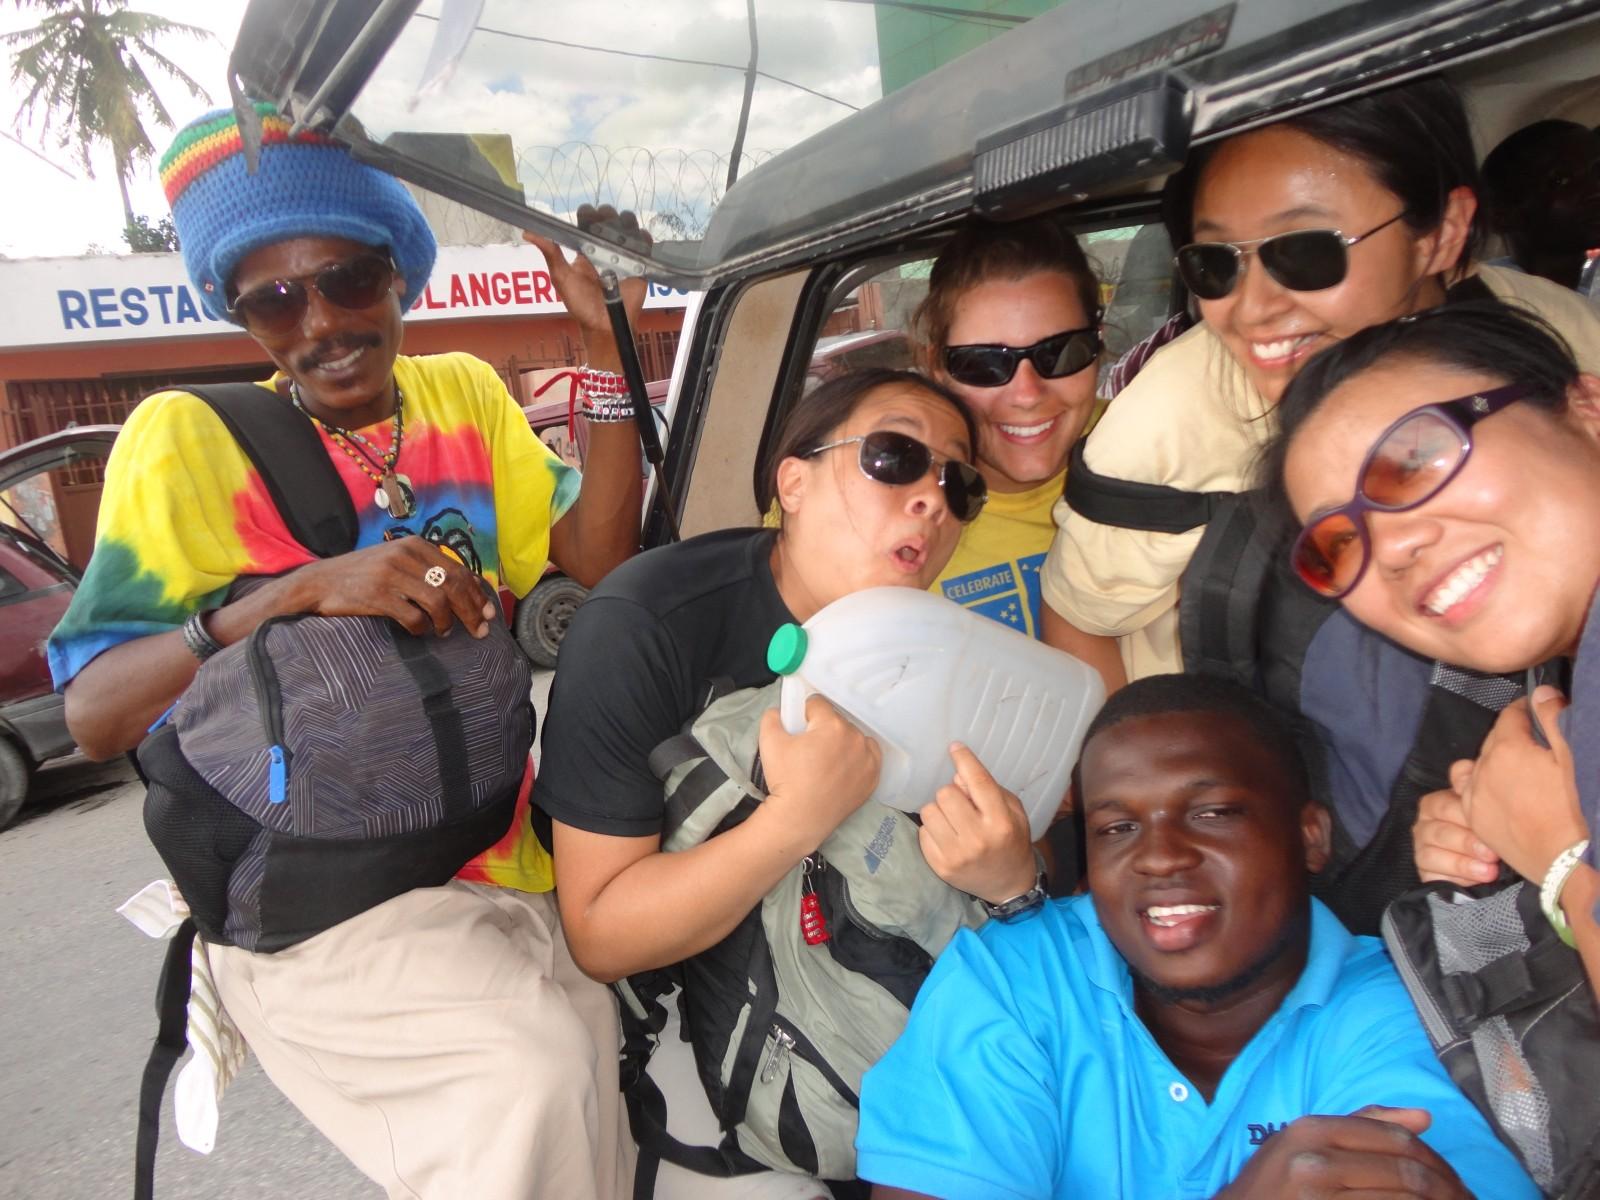 2013, Haiti, Cité Soleil, TWA. Third World Awareness, volunteers, friends, tap tap, transportation